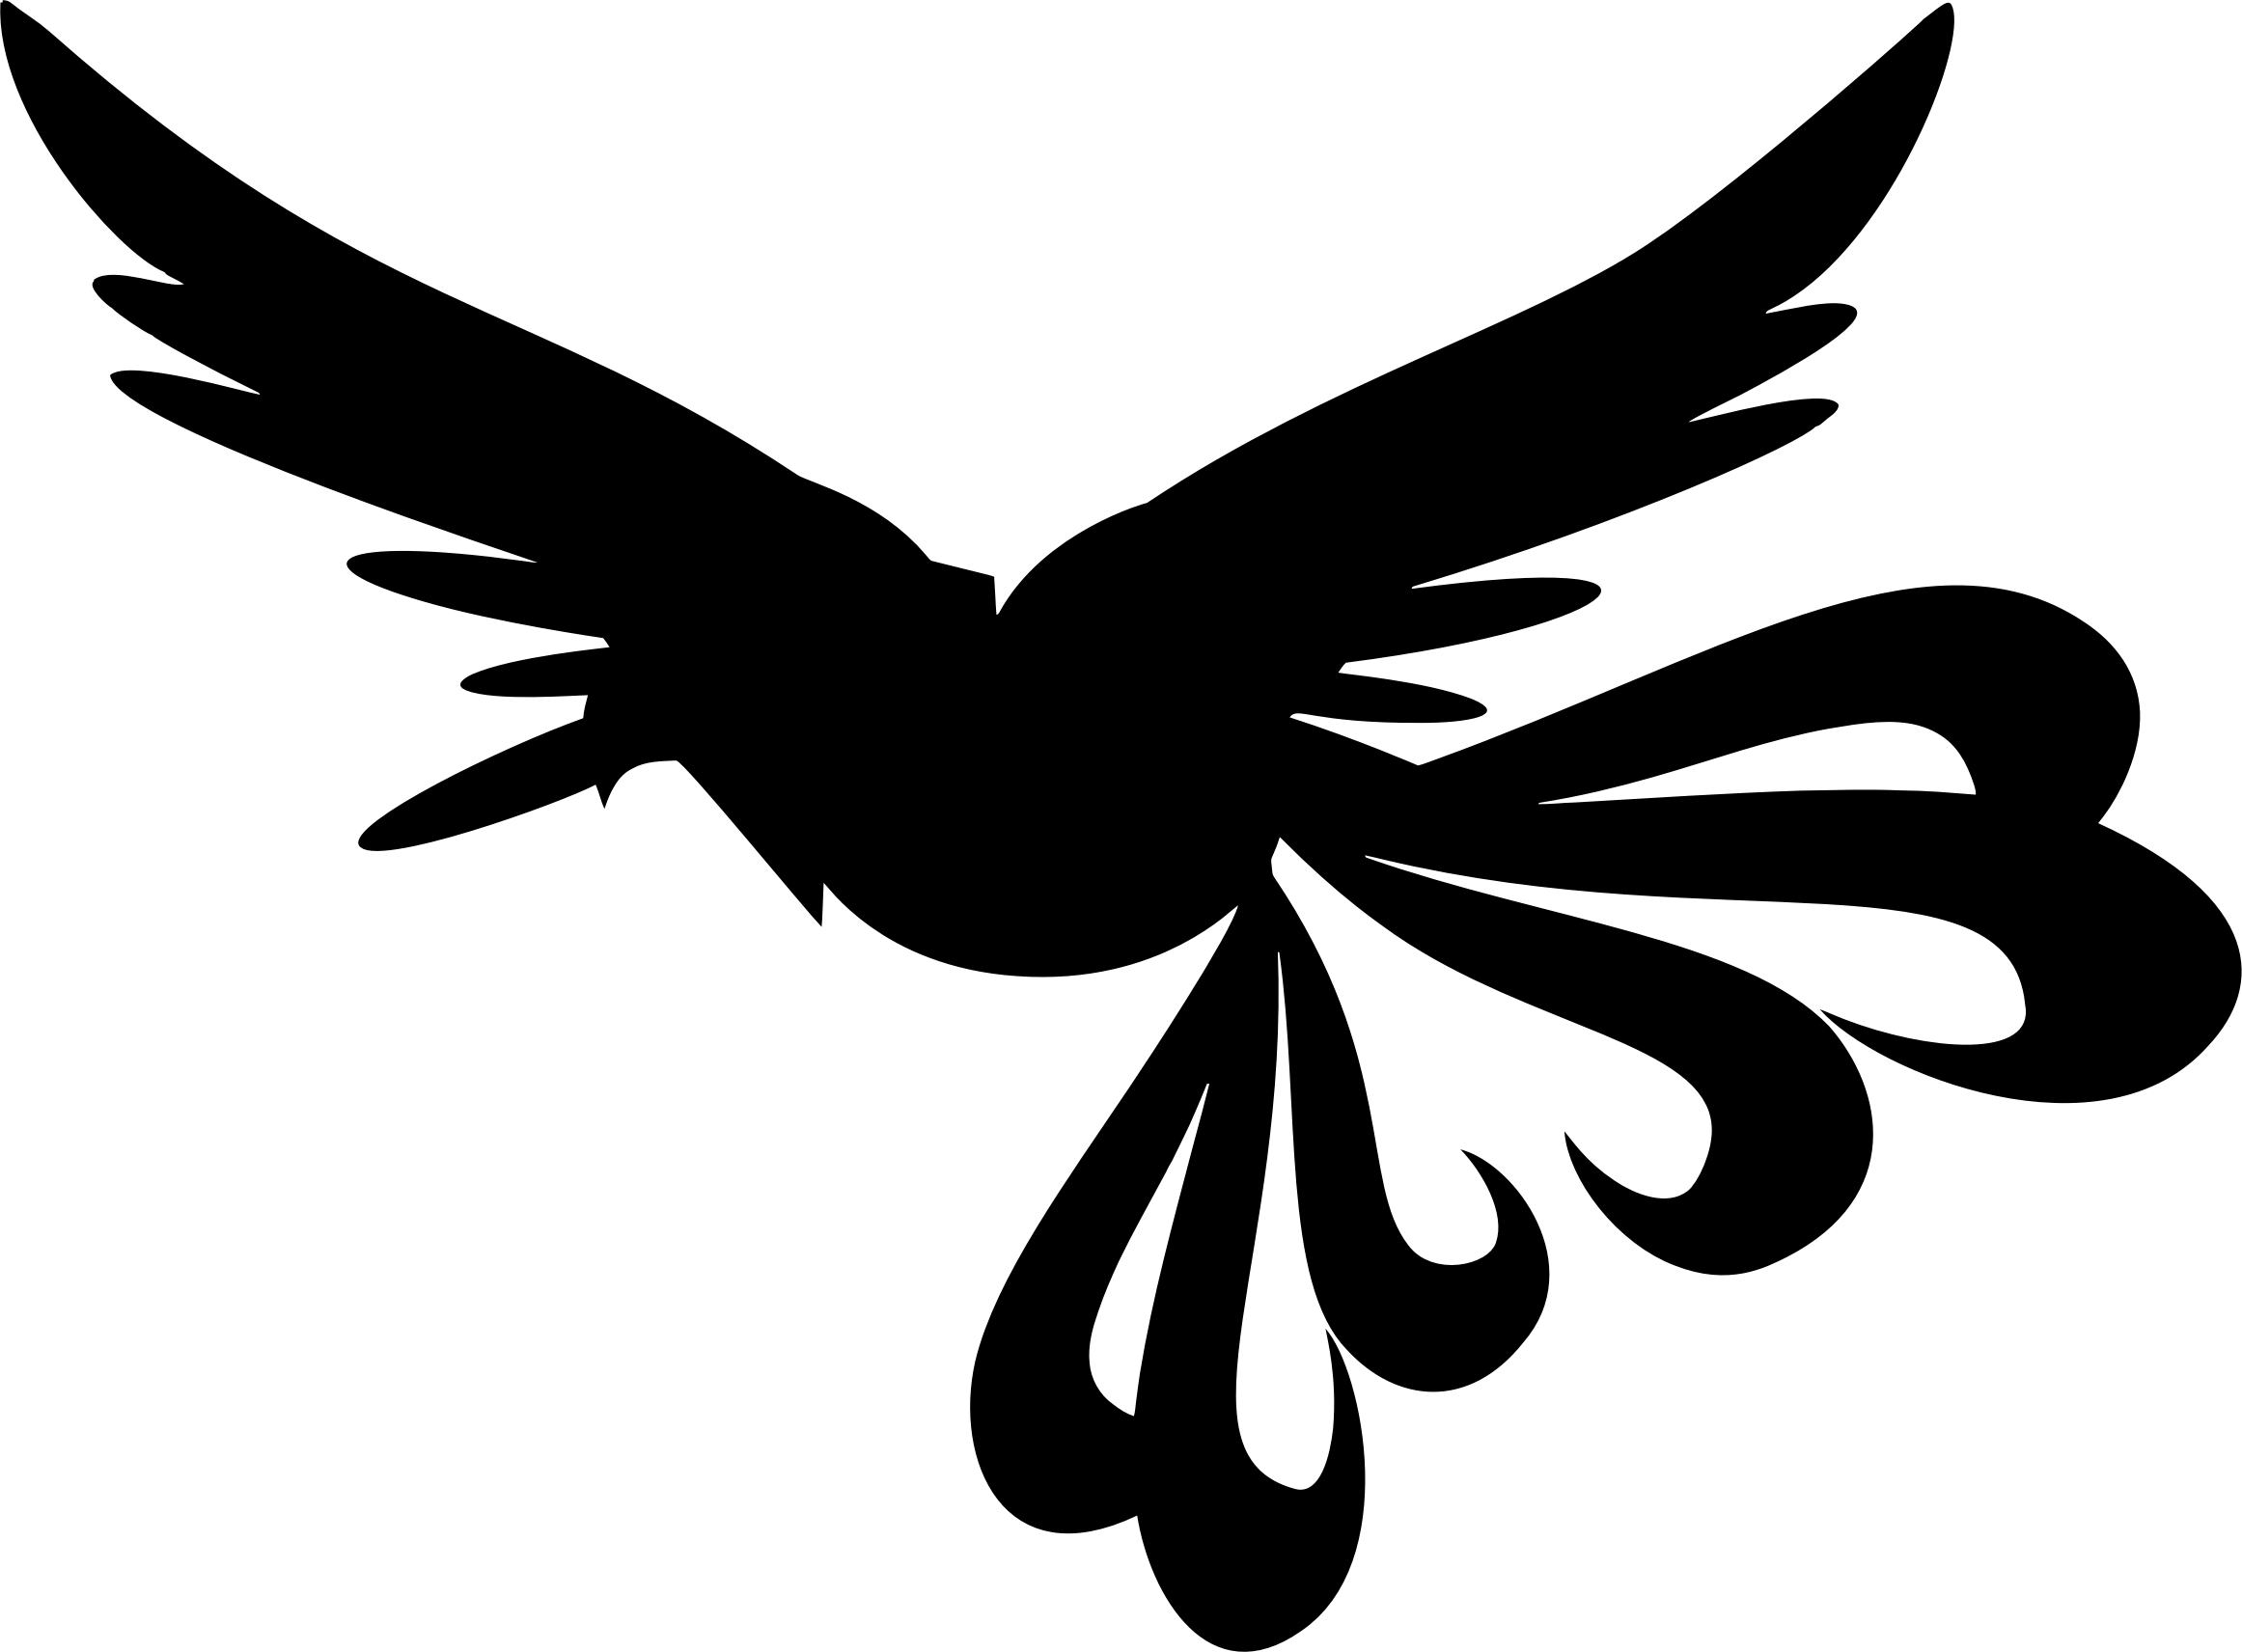 Phoenix clipart silhouette Phoenix Silhouette Clipart Phoenix Silhouette